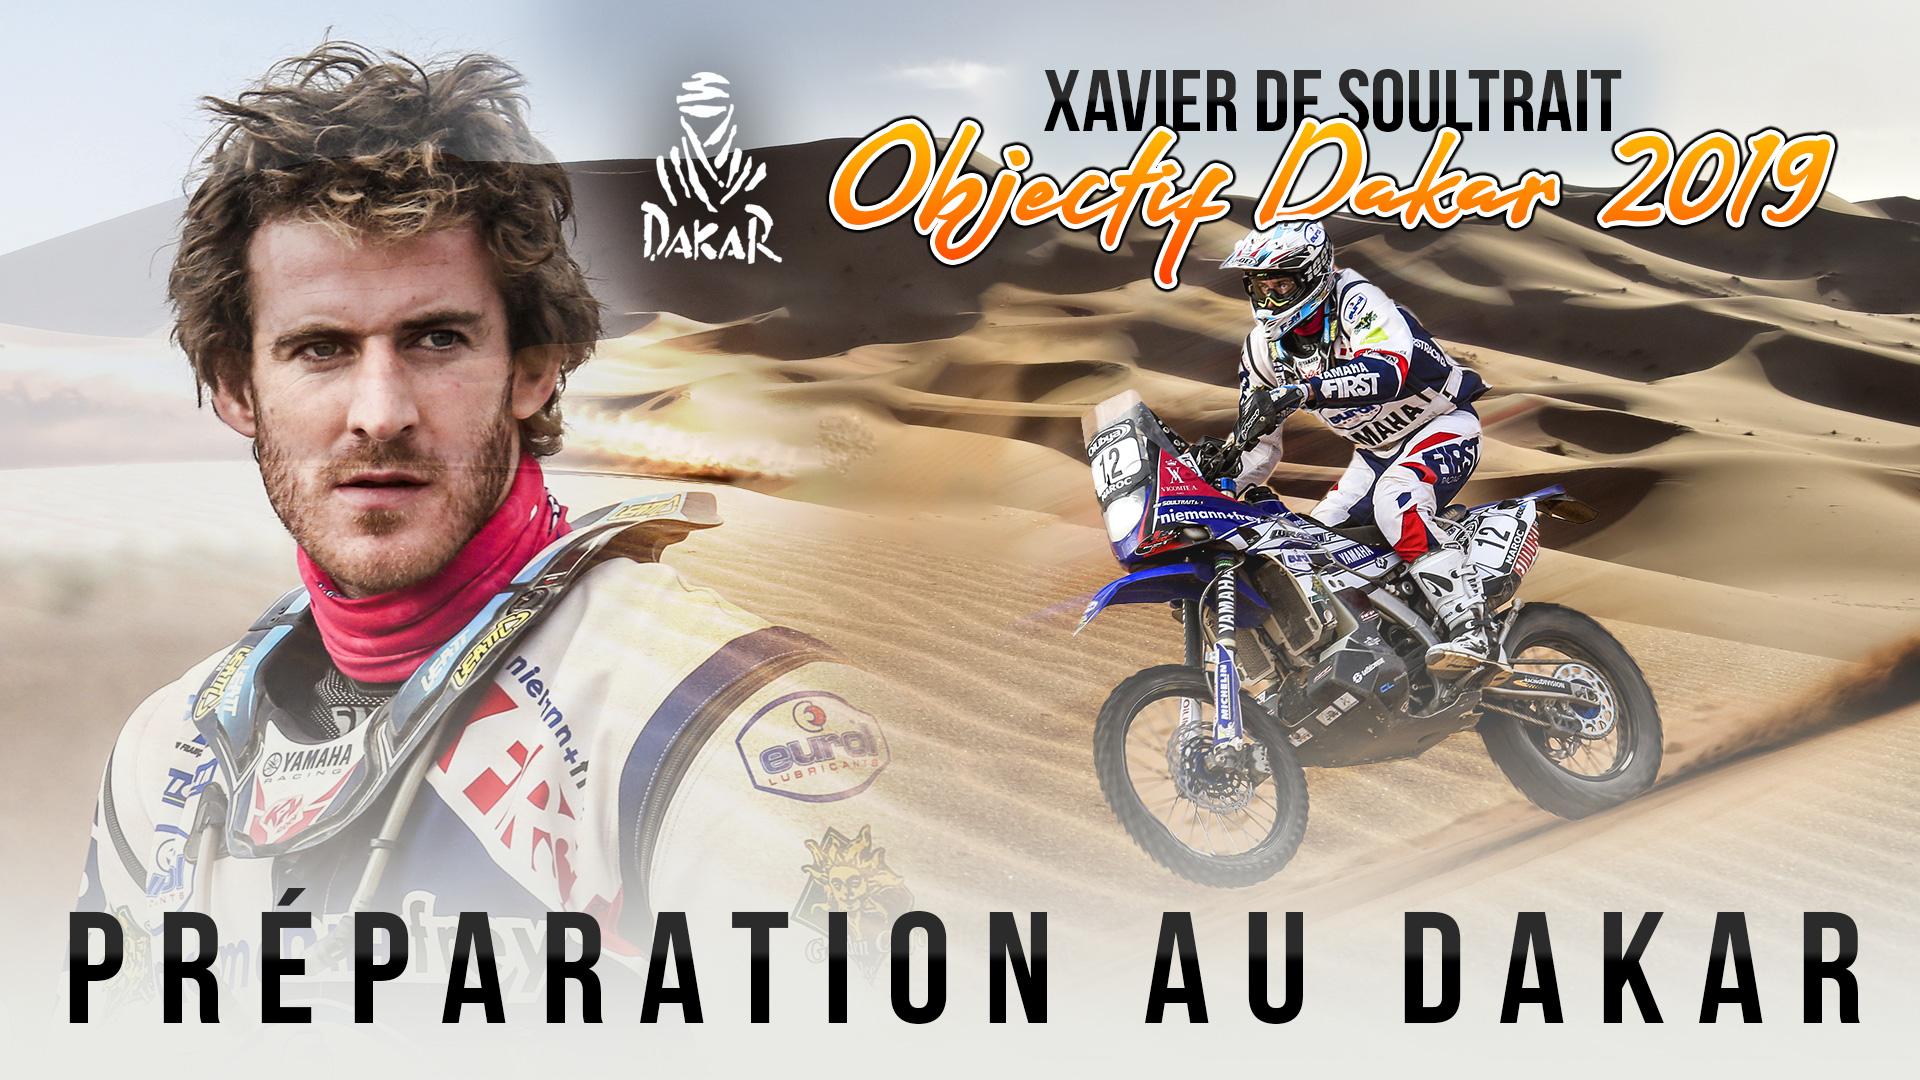 Objectif-Dakar-2019-avec-Xavier-de-Soultrait-la-preparation-au-Dakar